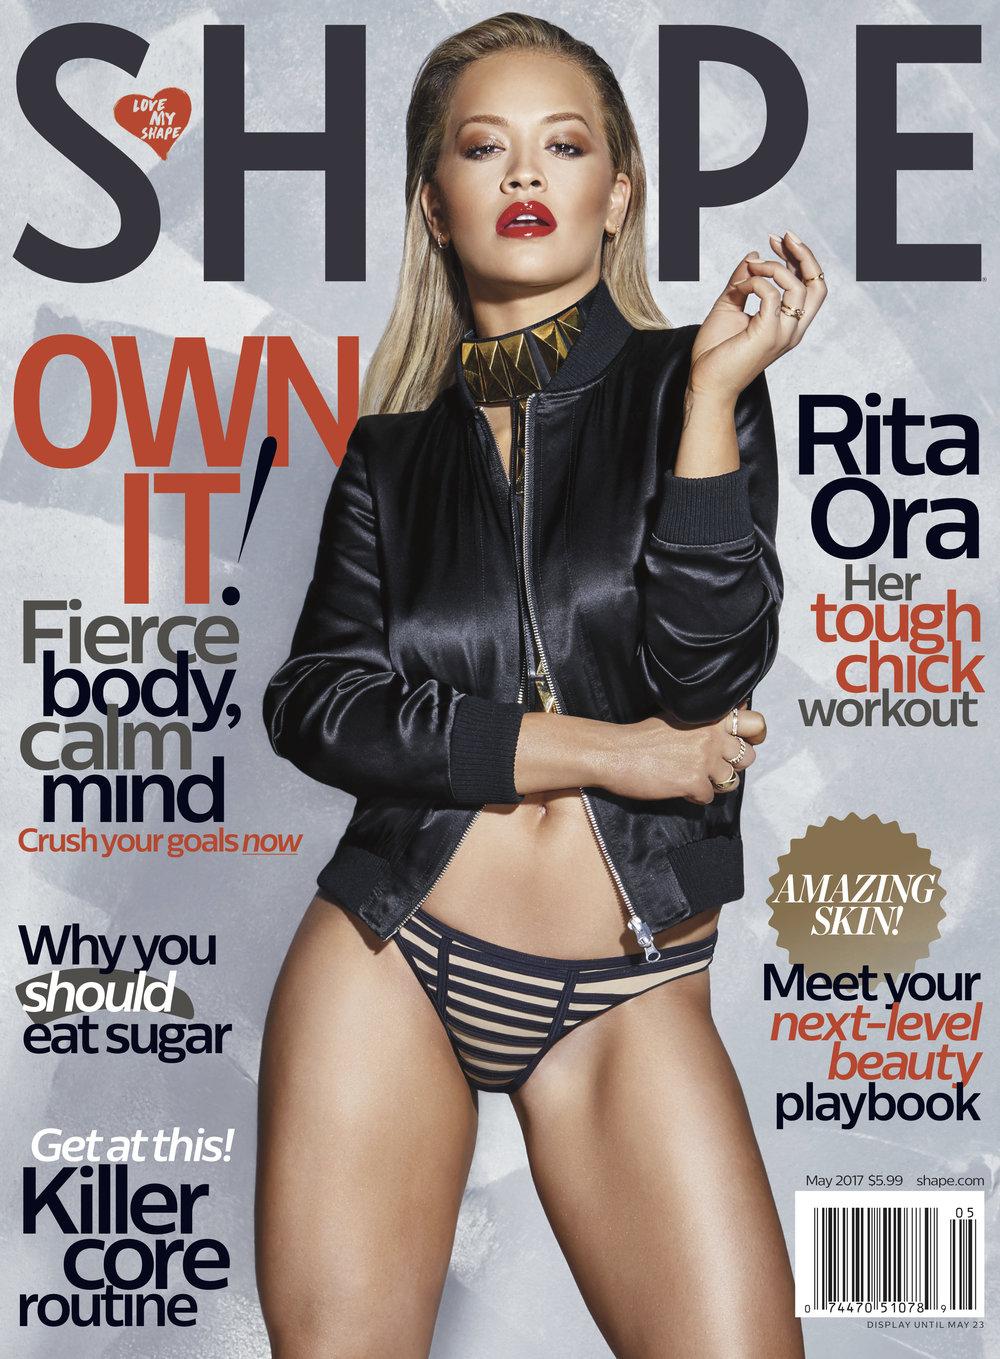 rota-ora-shay-fine-jewelry-shape-magazine